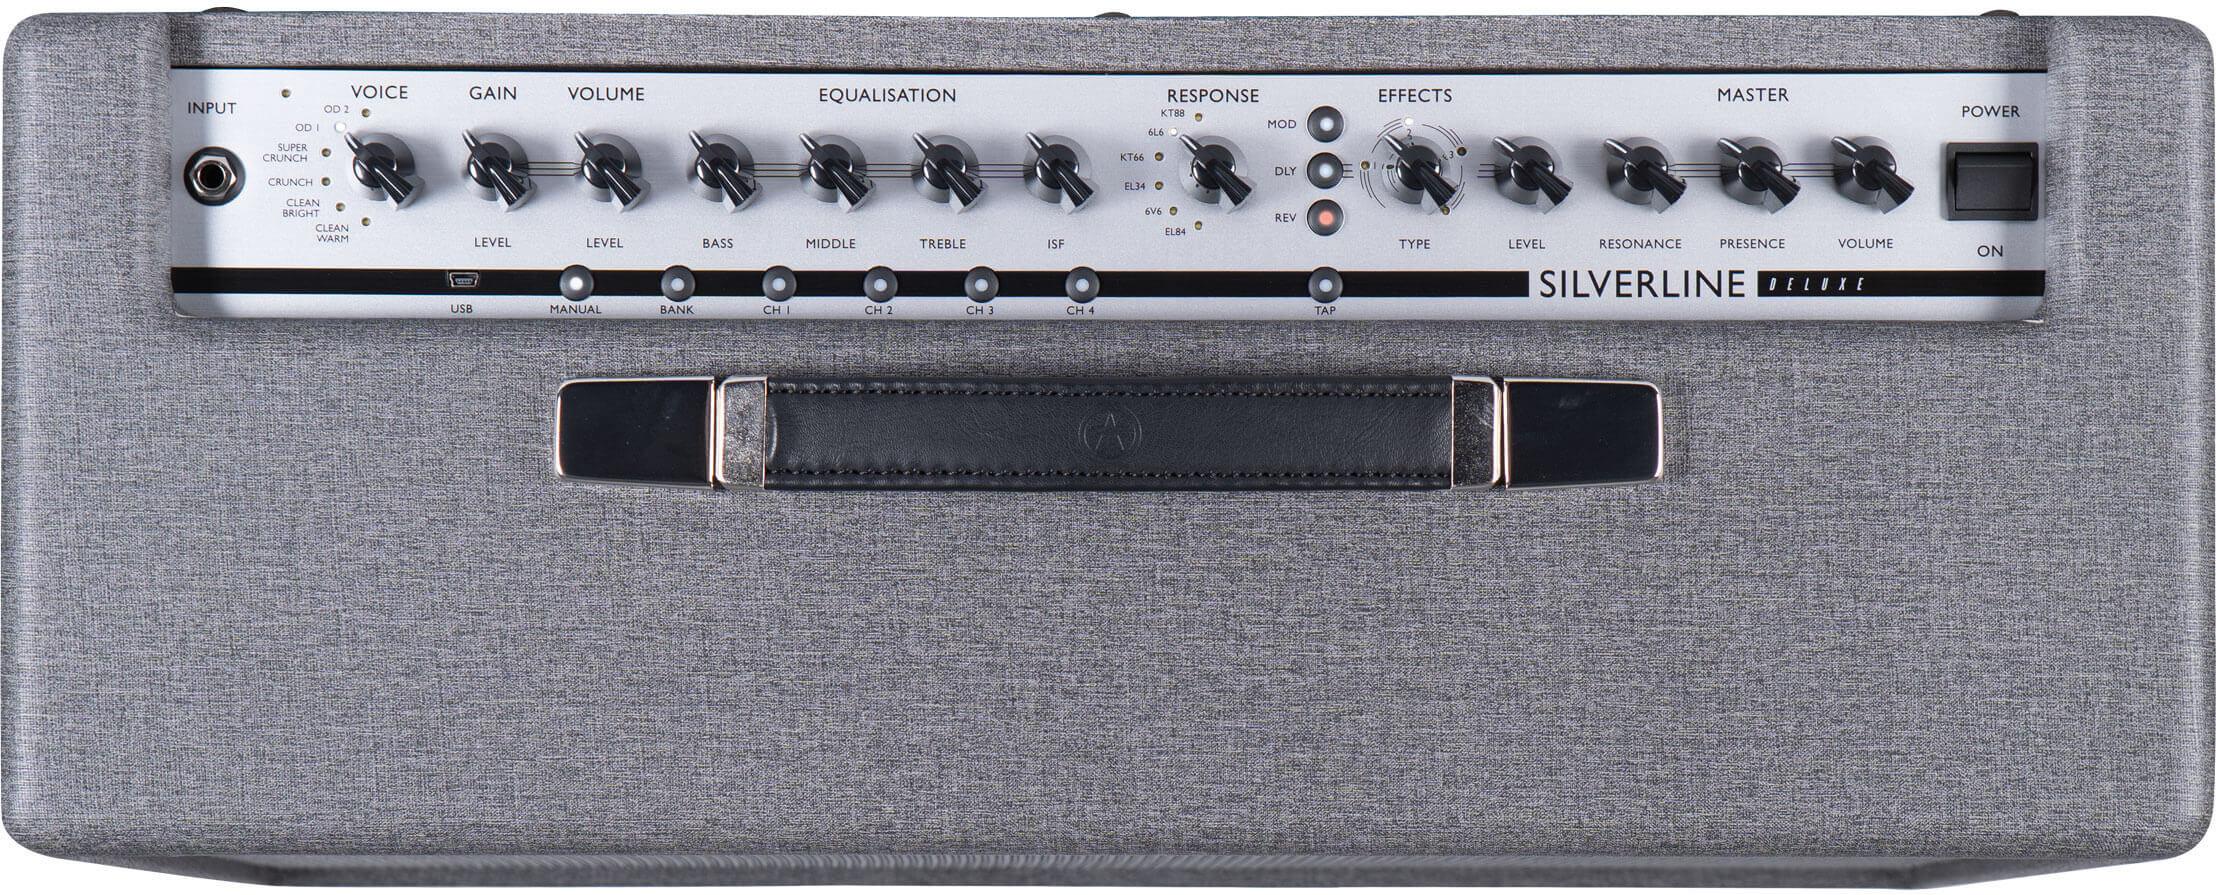 Silverline Deluxe Control Panel